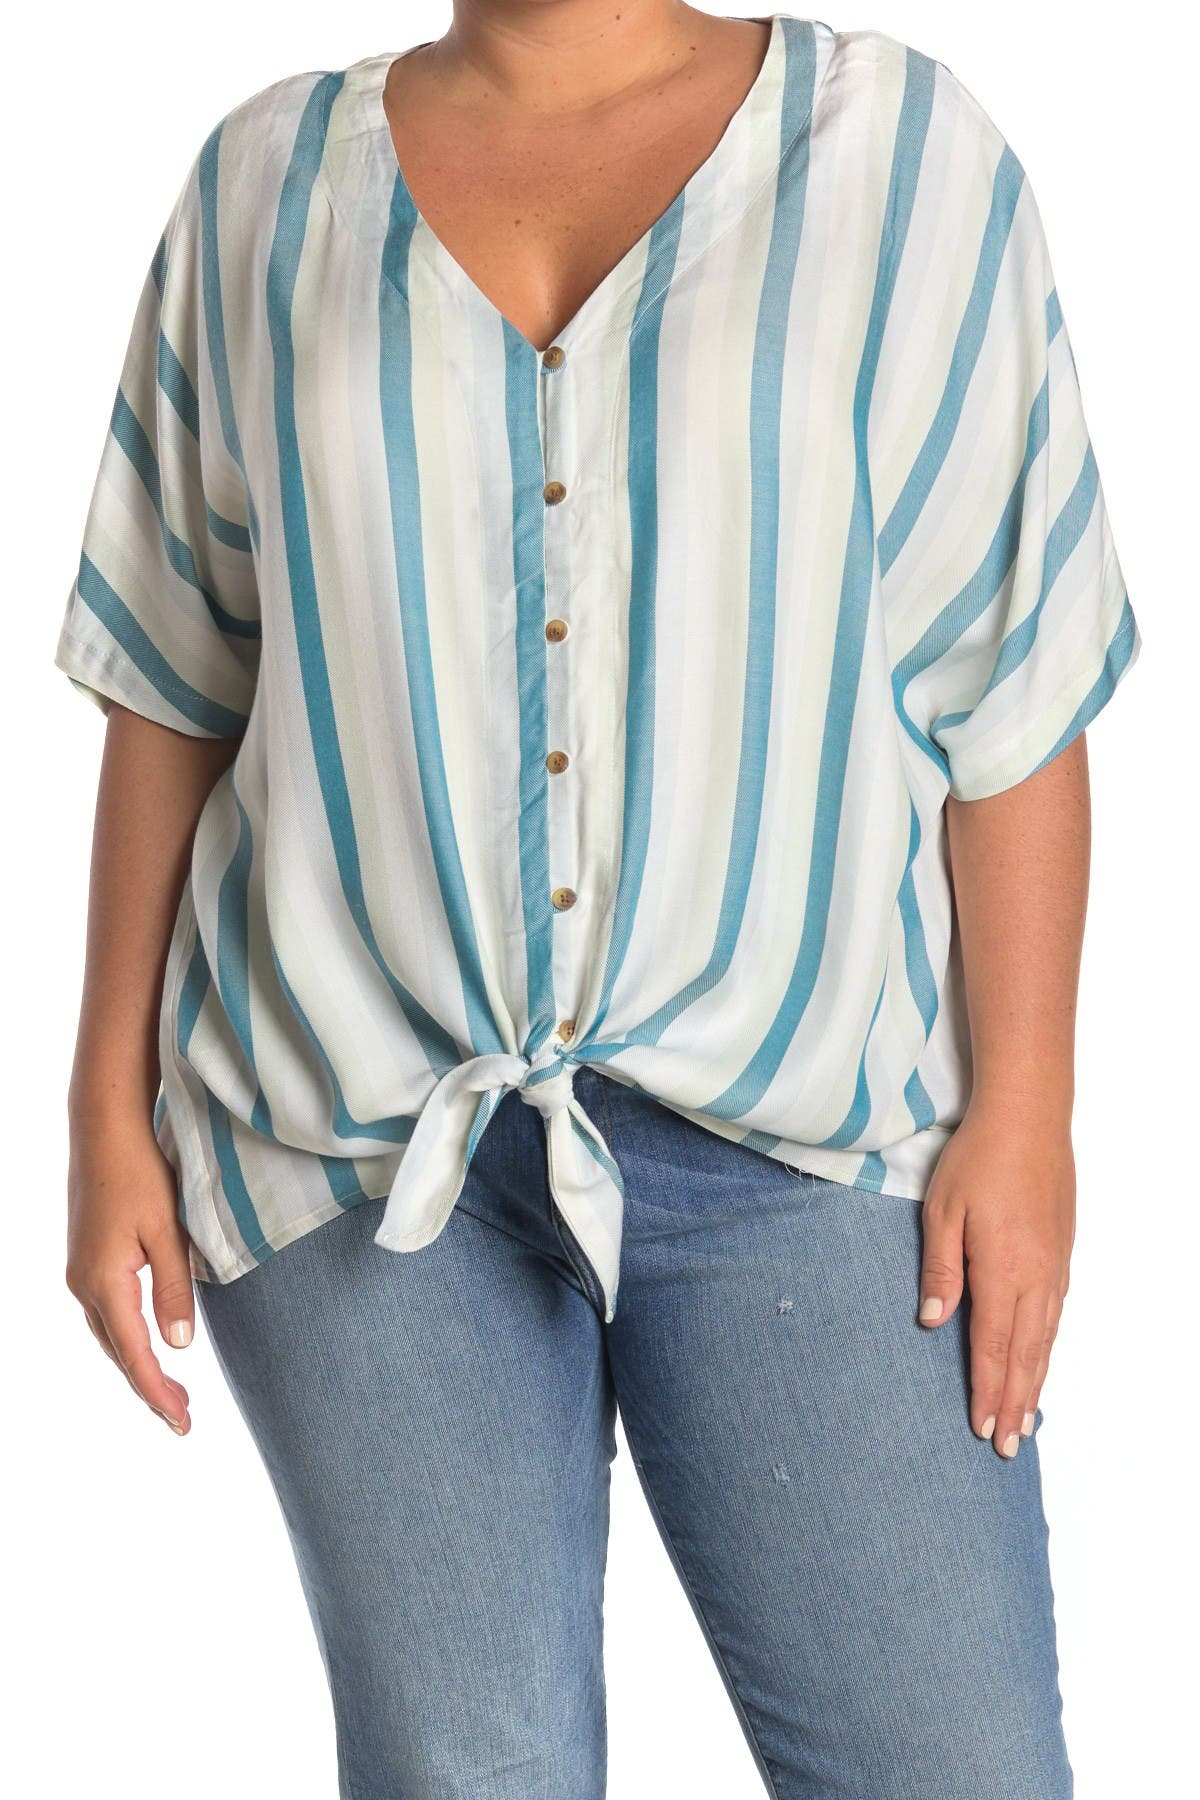 Image of Como Vintage Stripe Print Tie Front Button Down Shirt